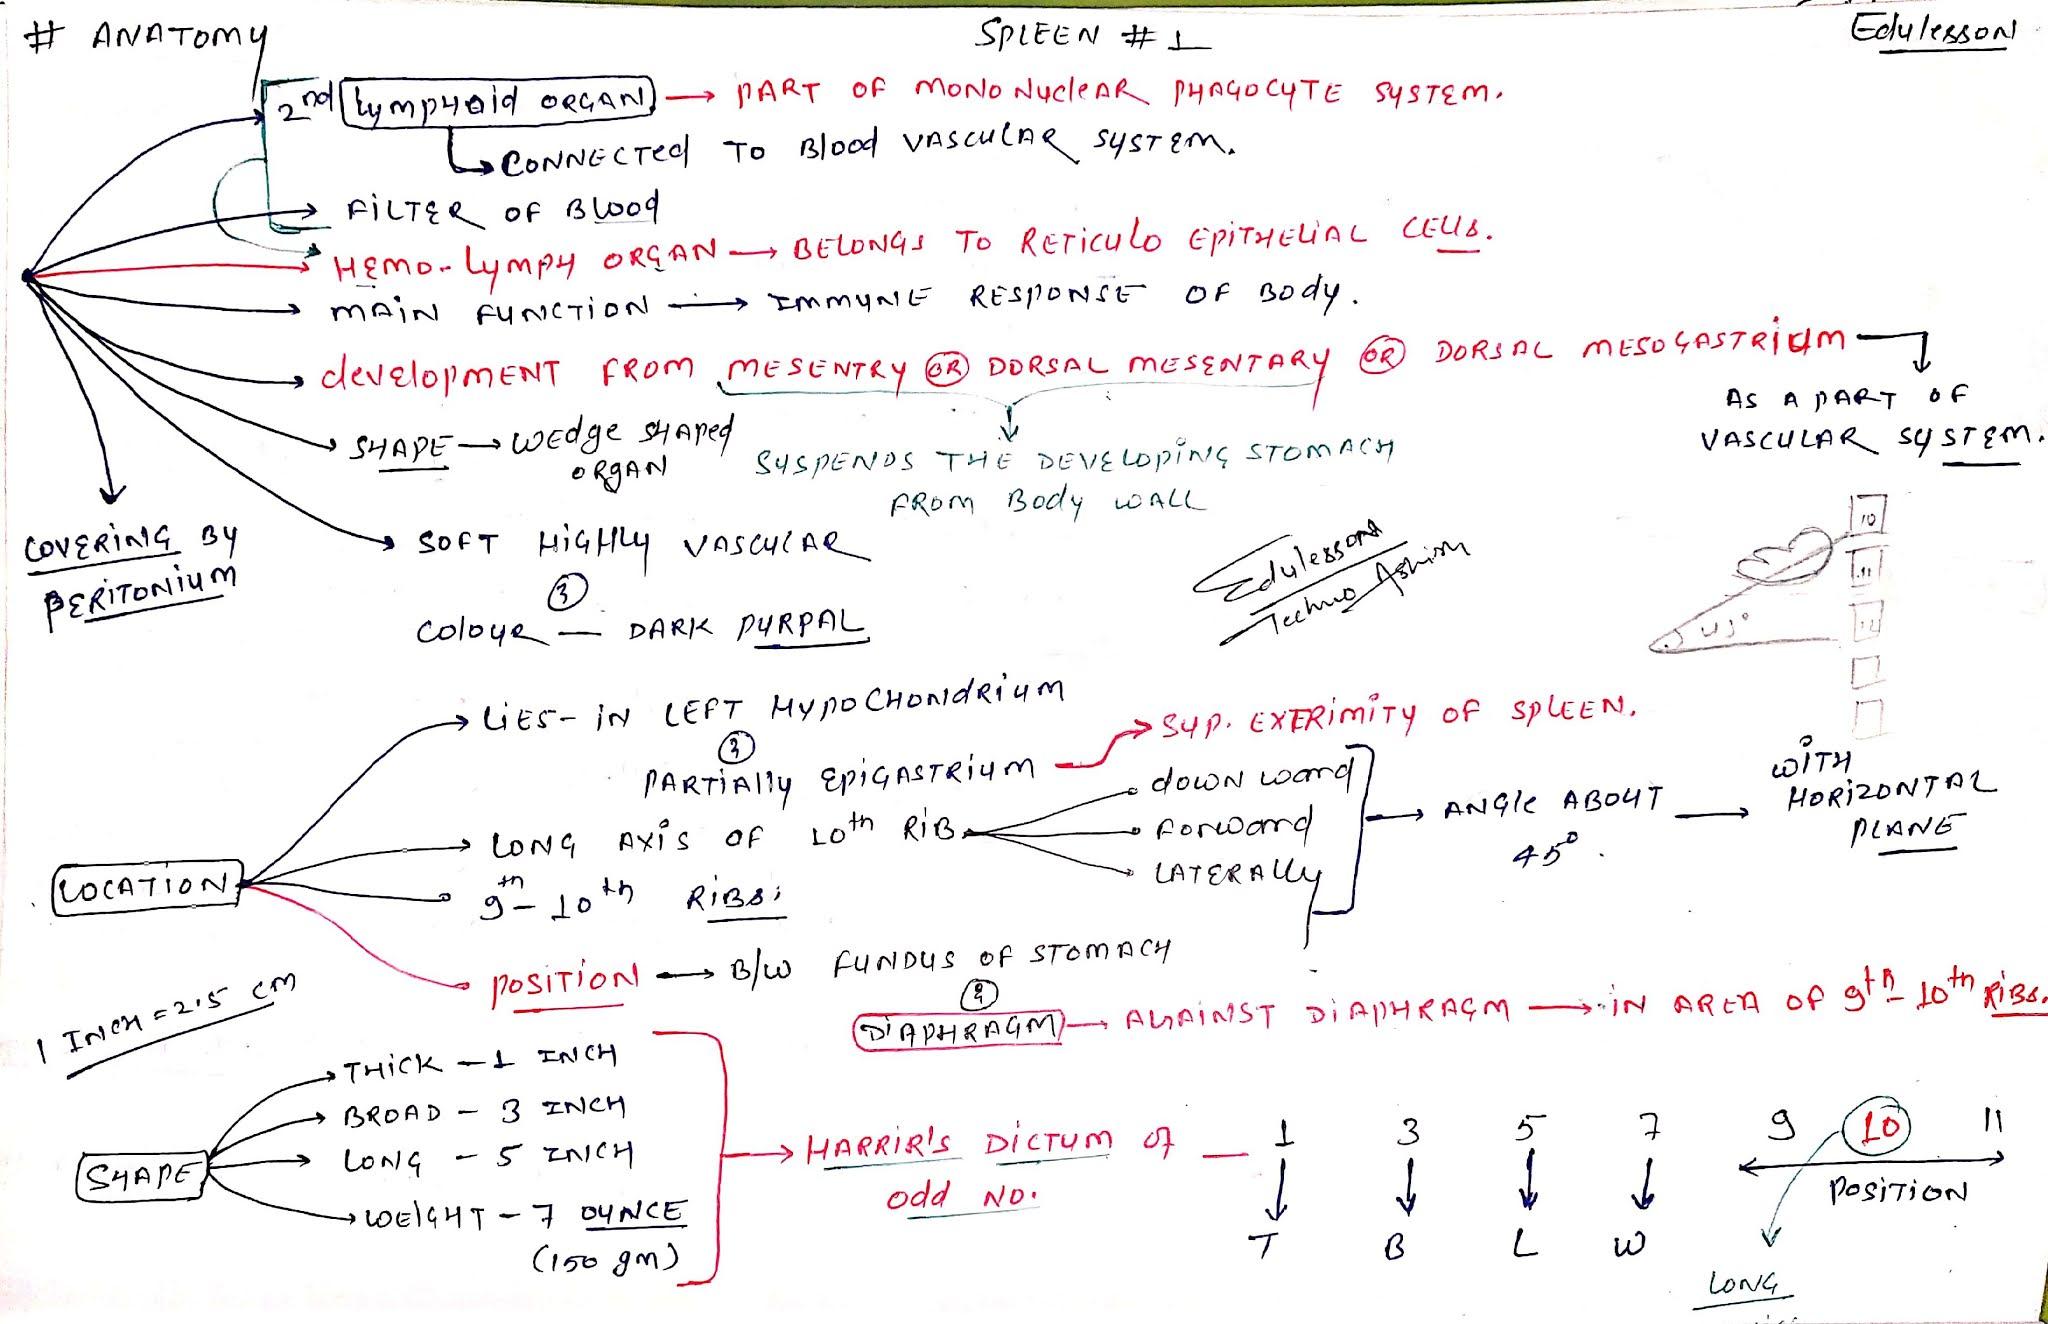 Anatomy of Spleen 1 - About spleen, Location, Shape, Size (EduLesson)